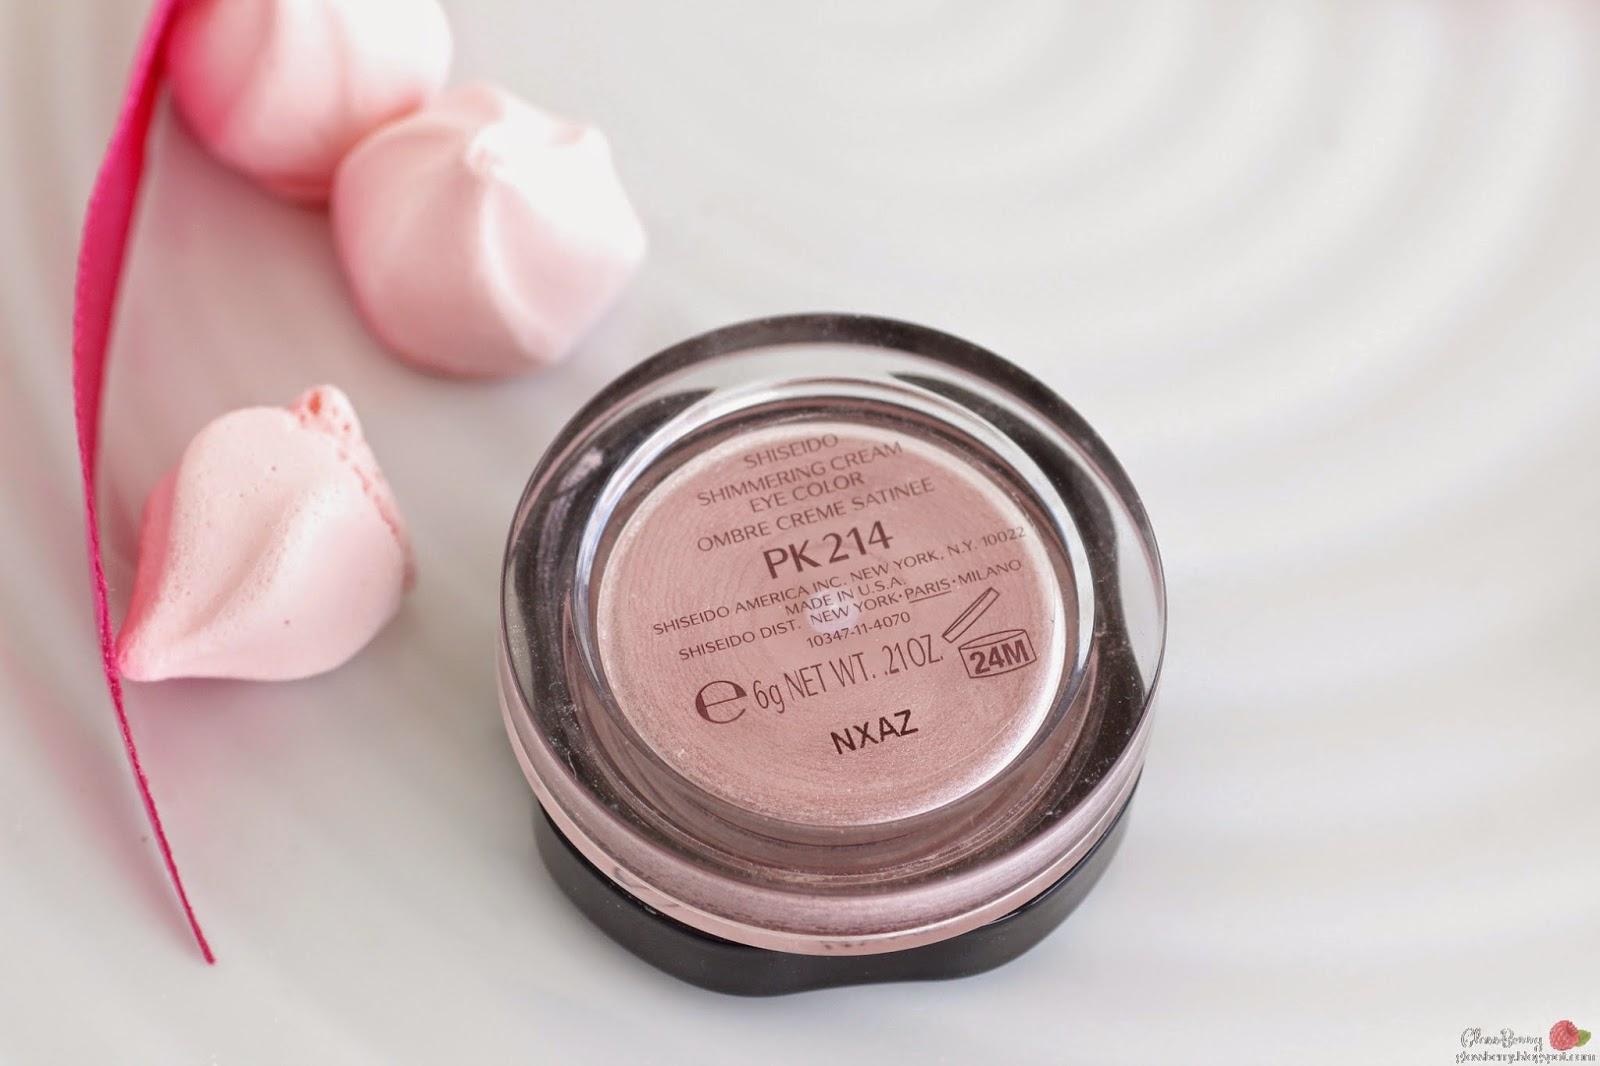 Shiseido - Shimmering Cream Eye Color pk214 review swatches צללית קרם שיסיידו